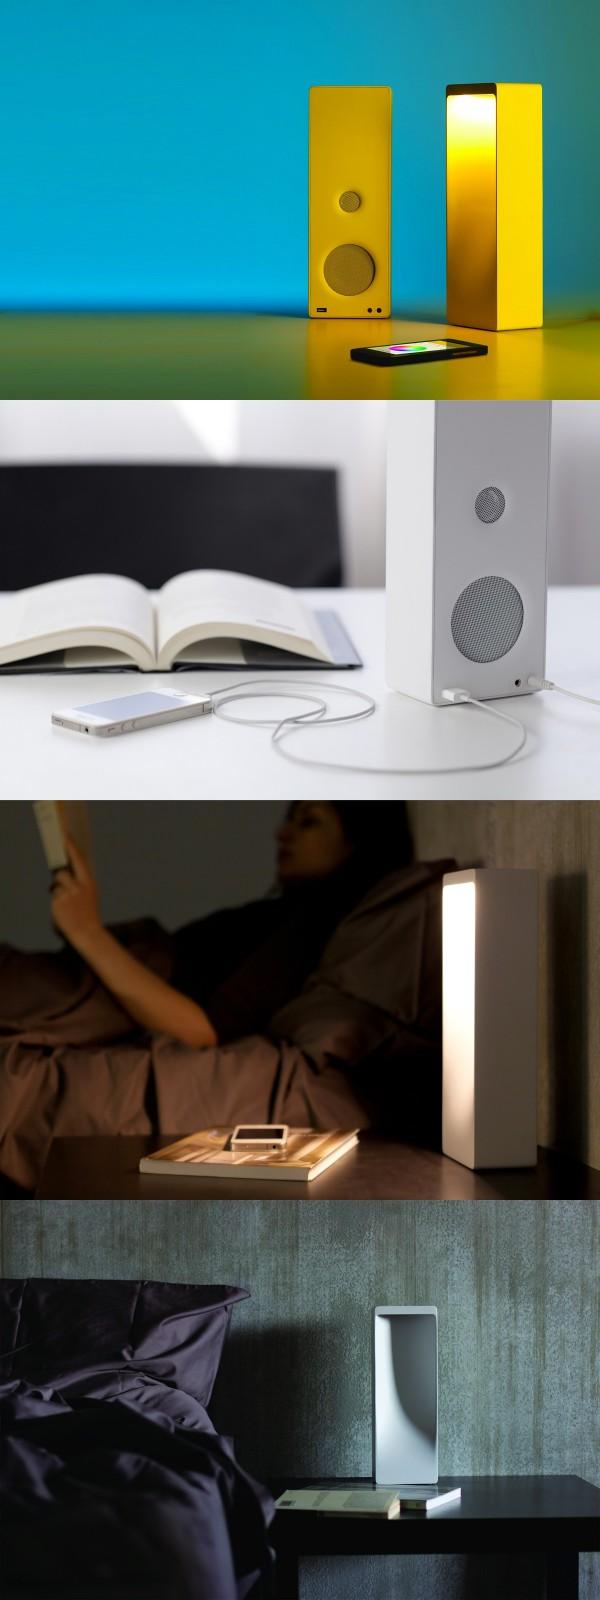 bluetooth-speaker-light-600x1600